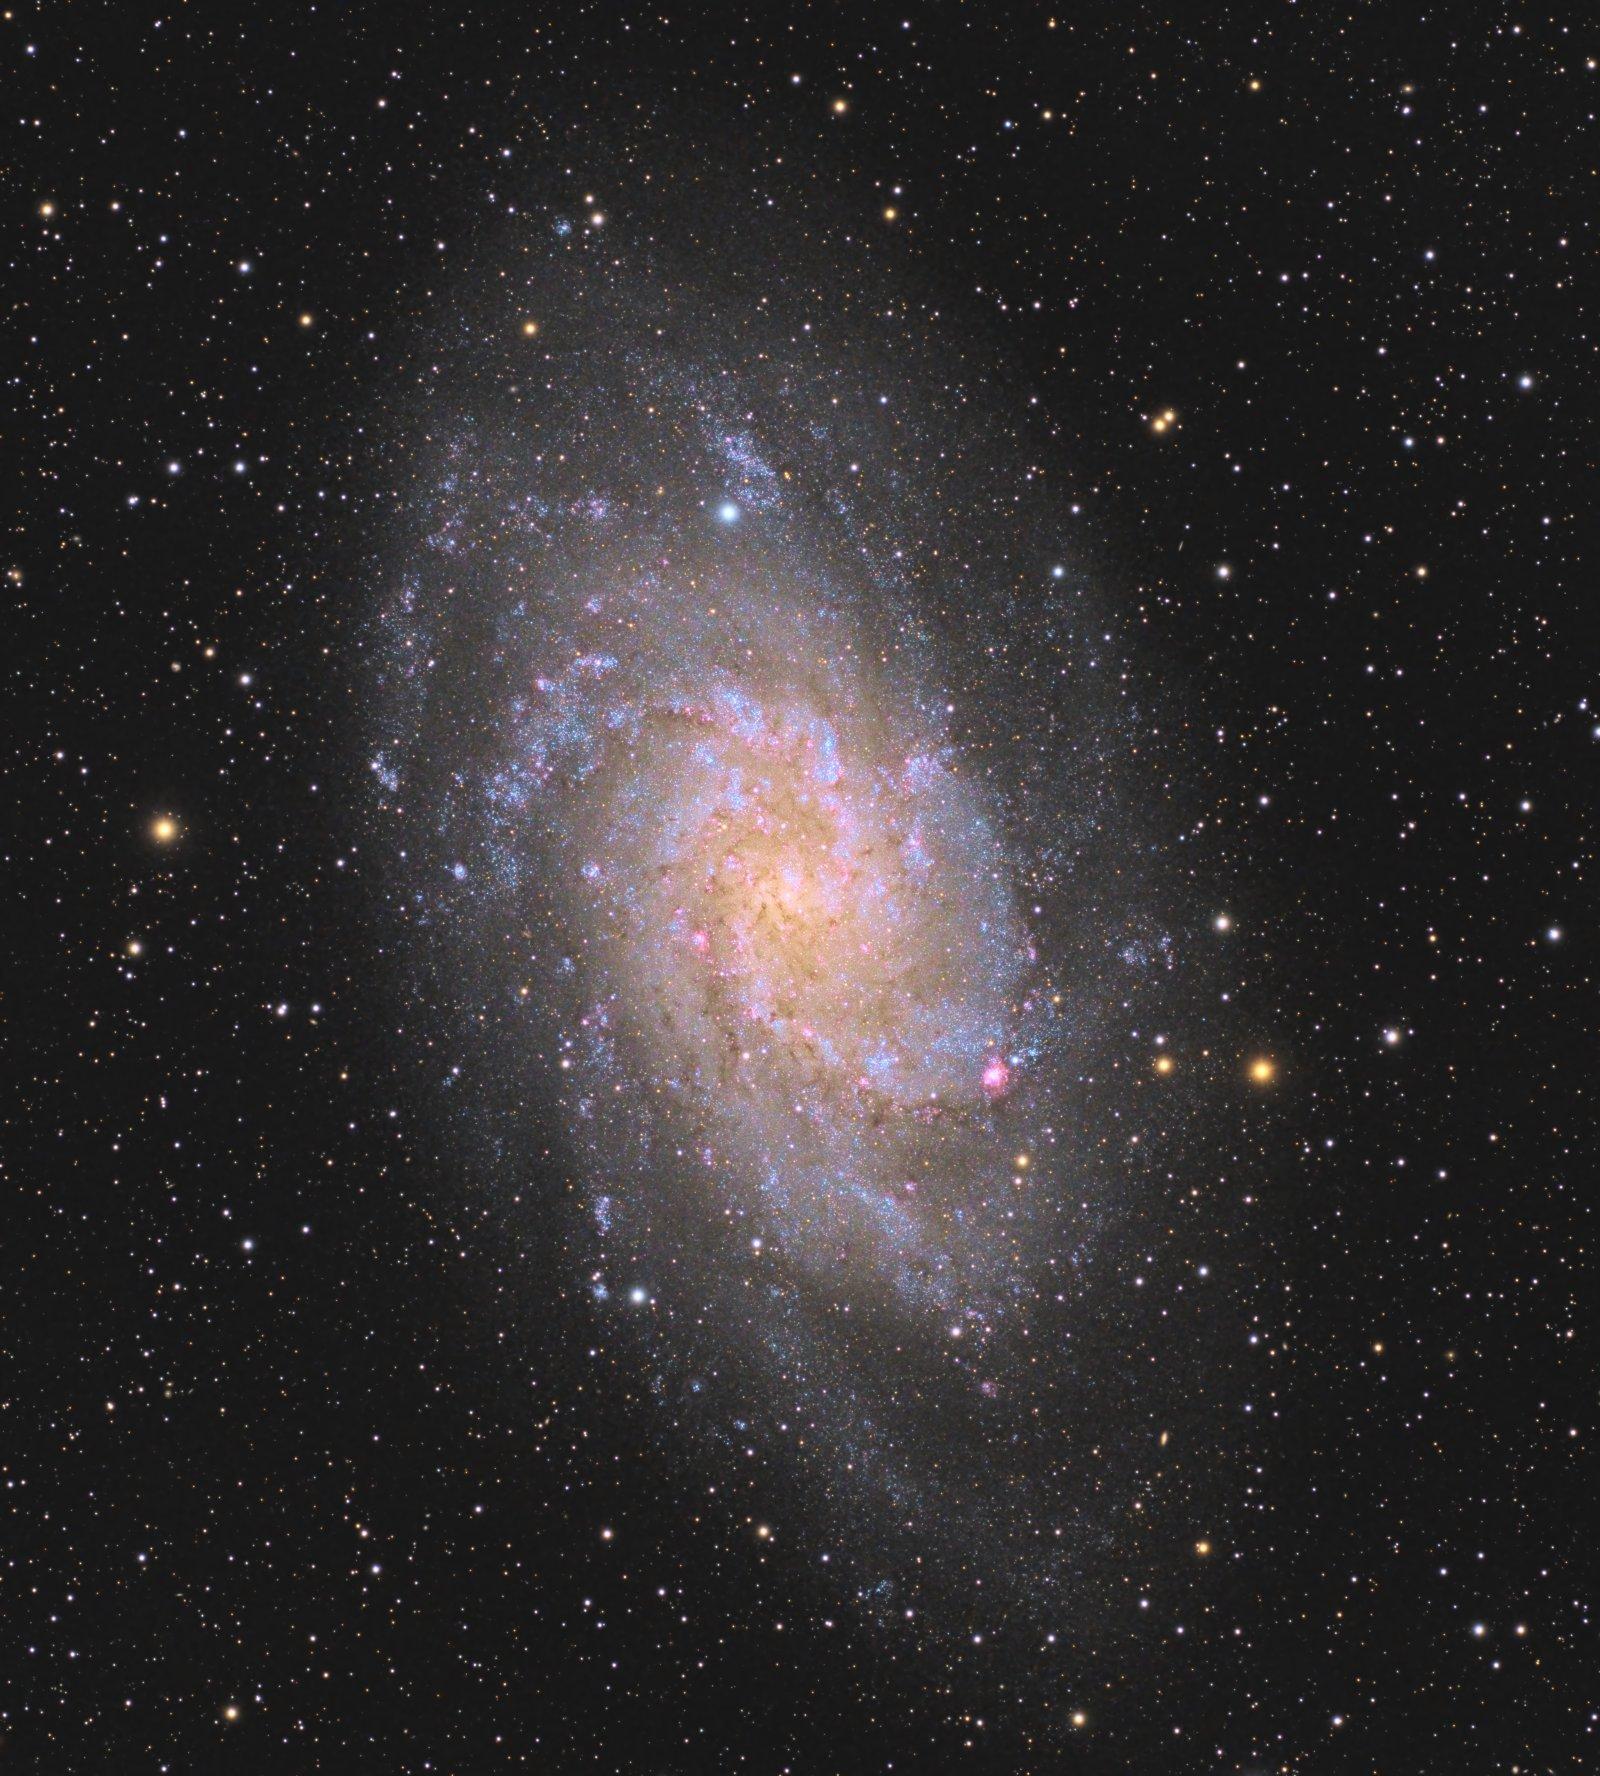 M33, The Triangulum Galaxy